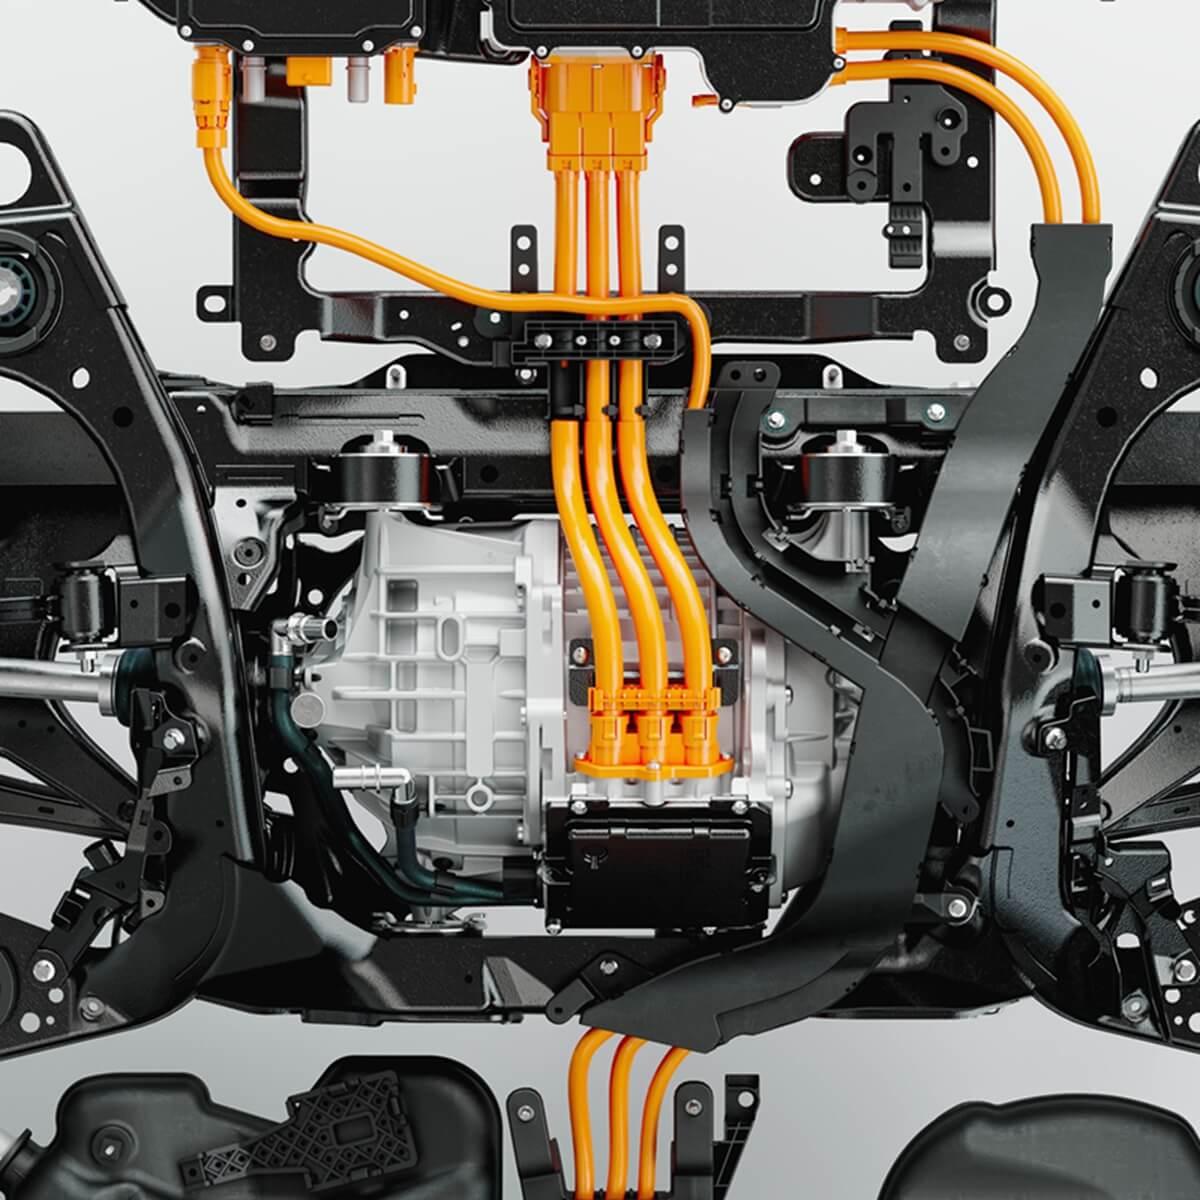 285882_Battery_image_-_Volvo_Cars_new_Recharge_plug-in_hybrid_powertrain.jpg